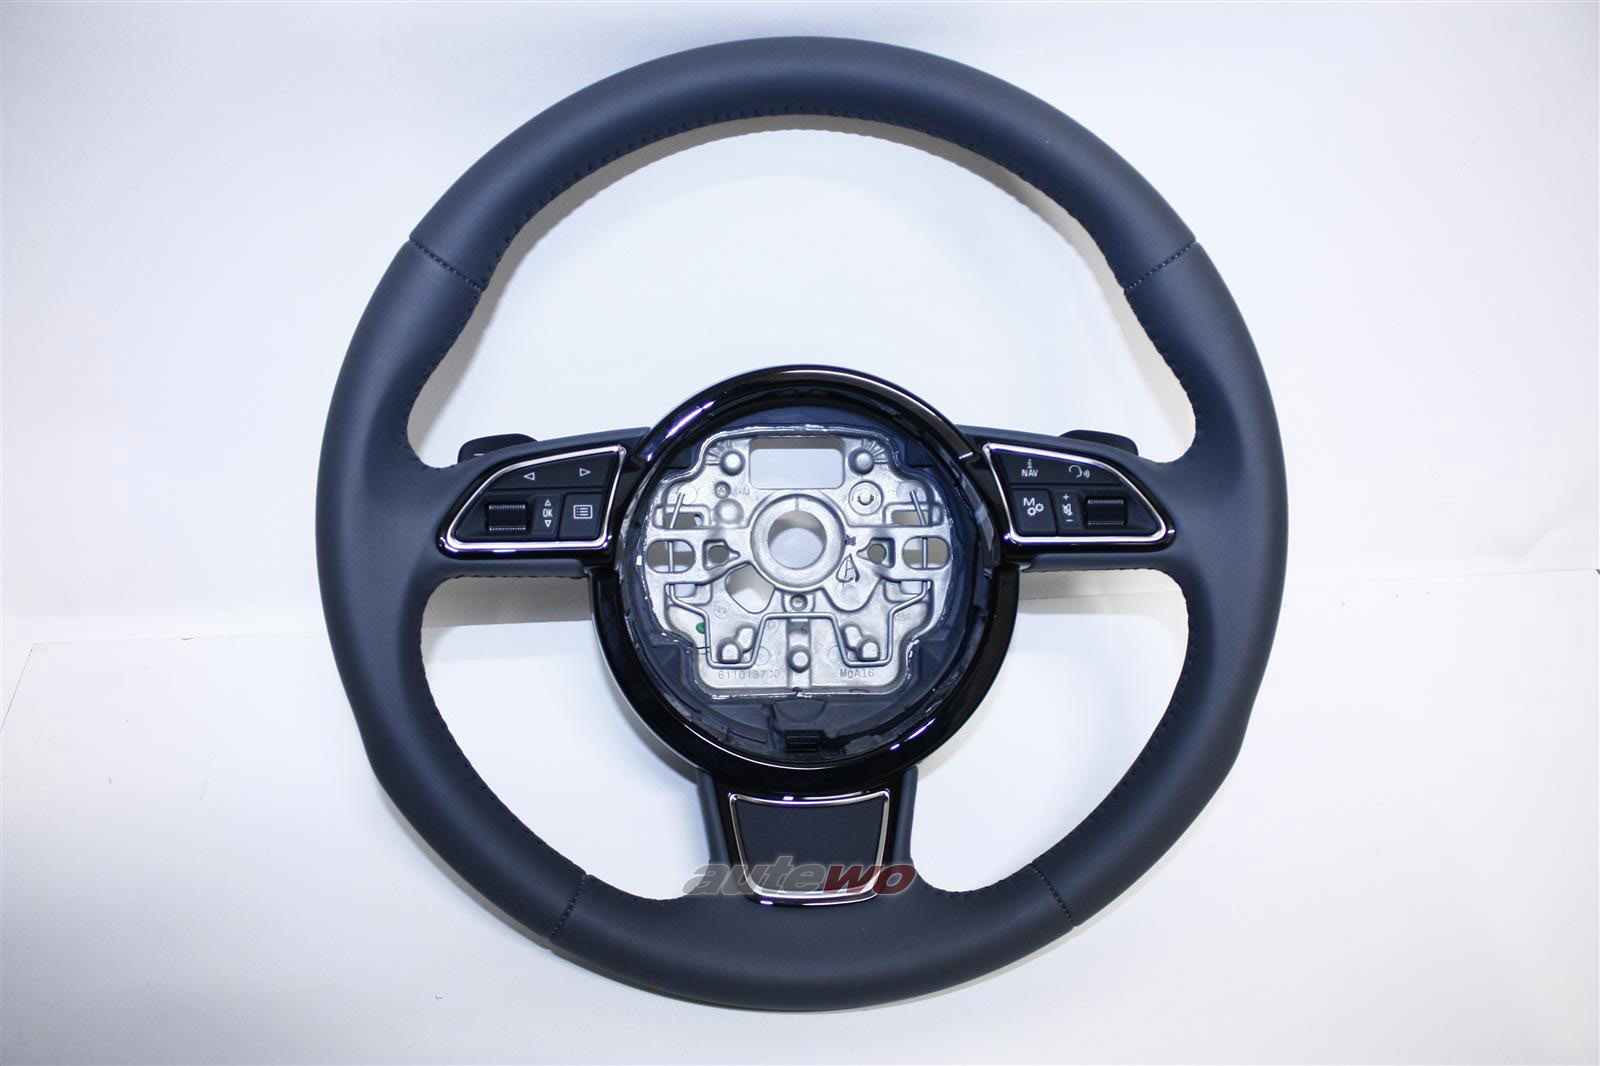 4H0419091G NEU Audi A8 D4 Sport-Leder-Lenkrad CJN stahlgrau